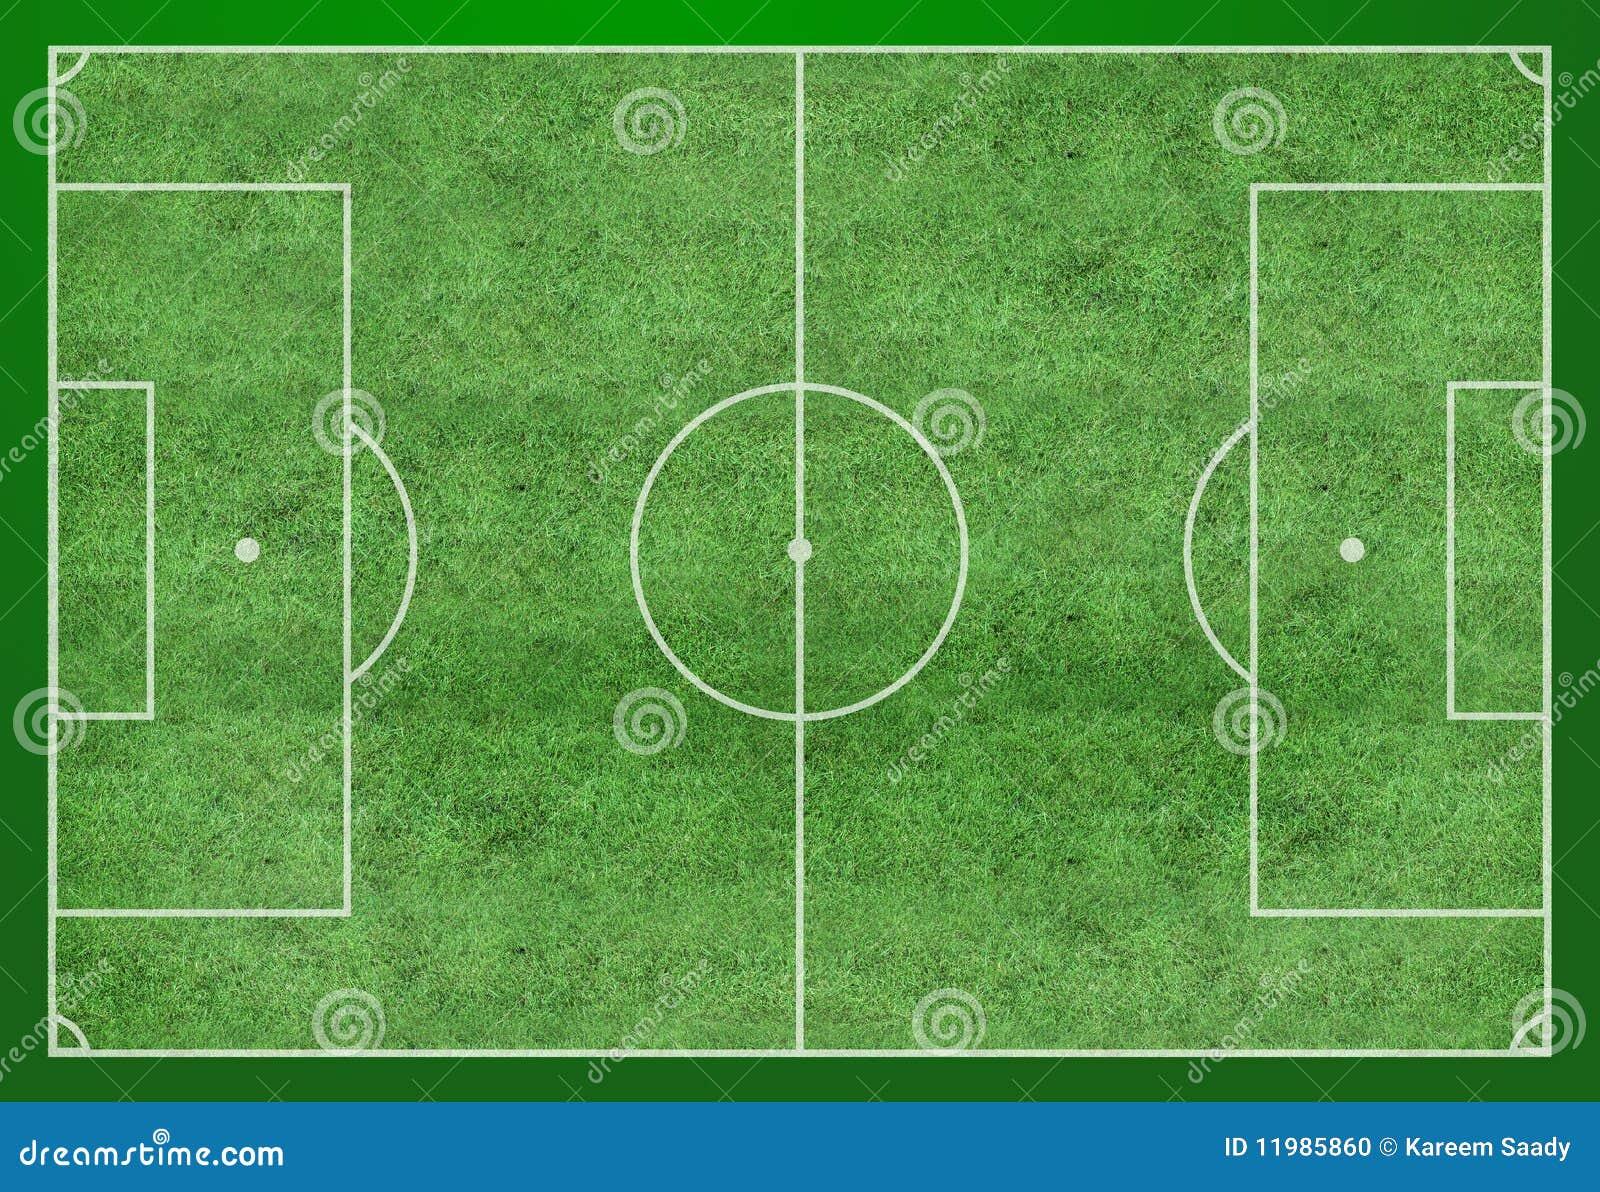 Soccer Field Layout Stock Photo